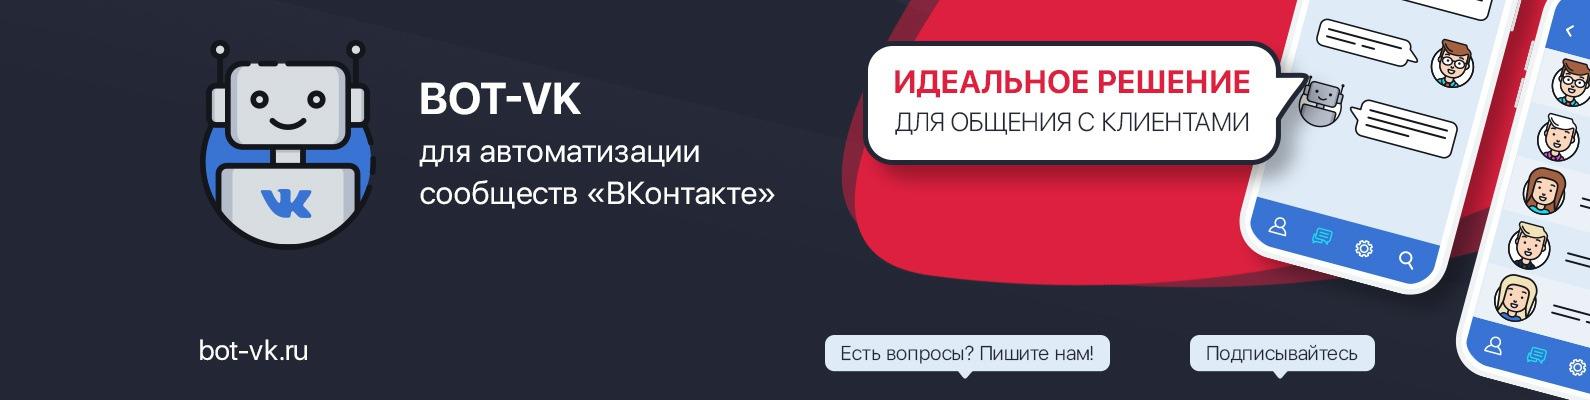 WOOW! БОТ | ВКонтакте